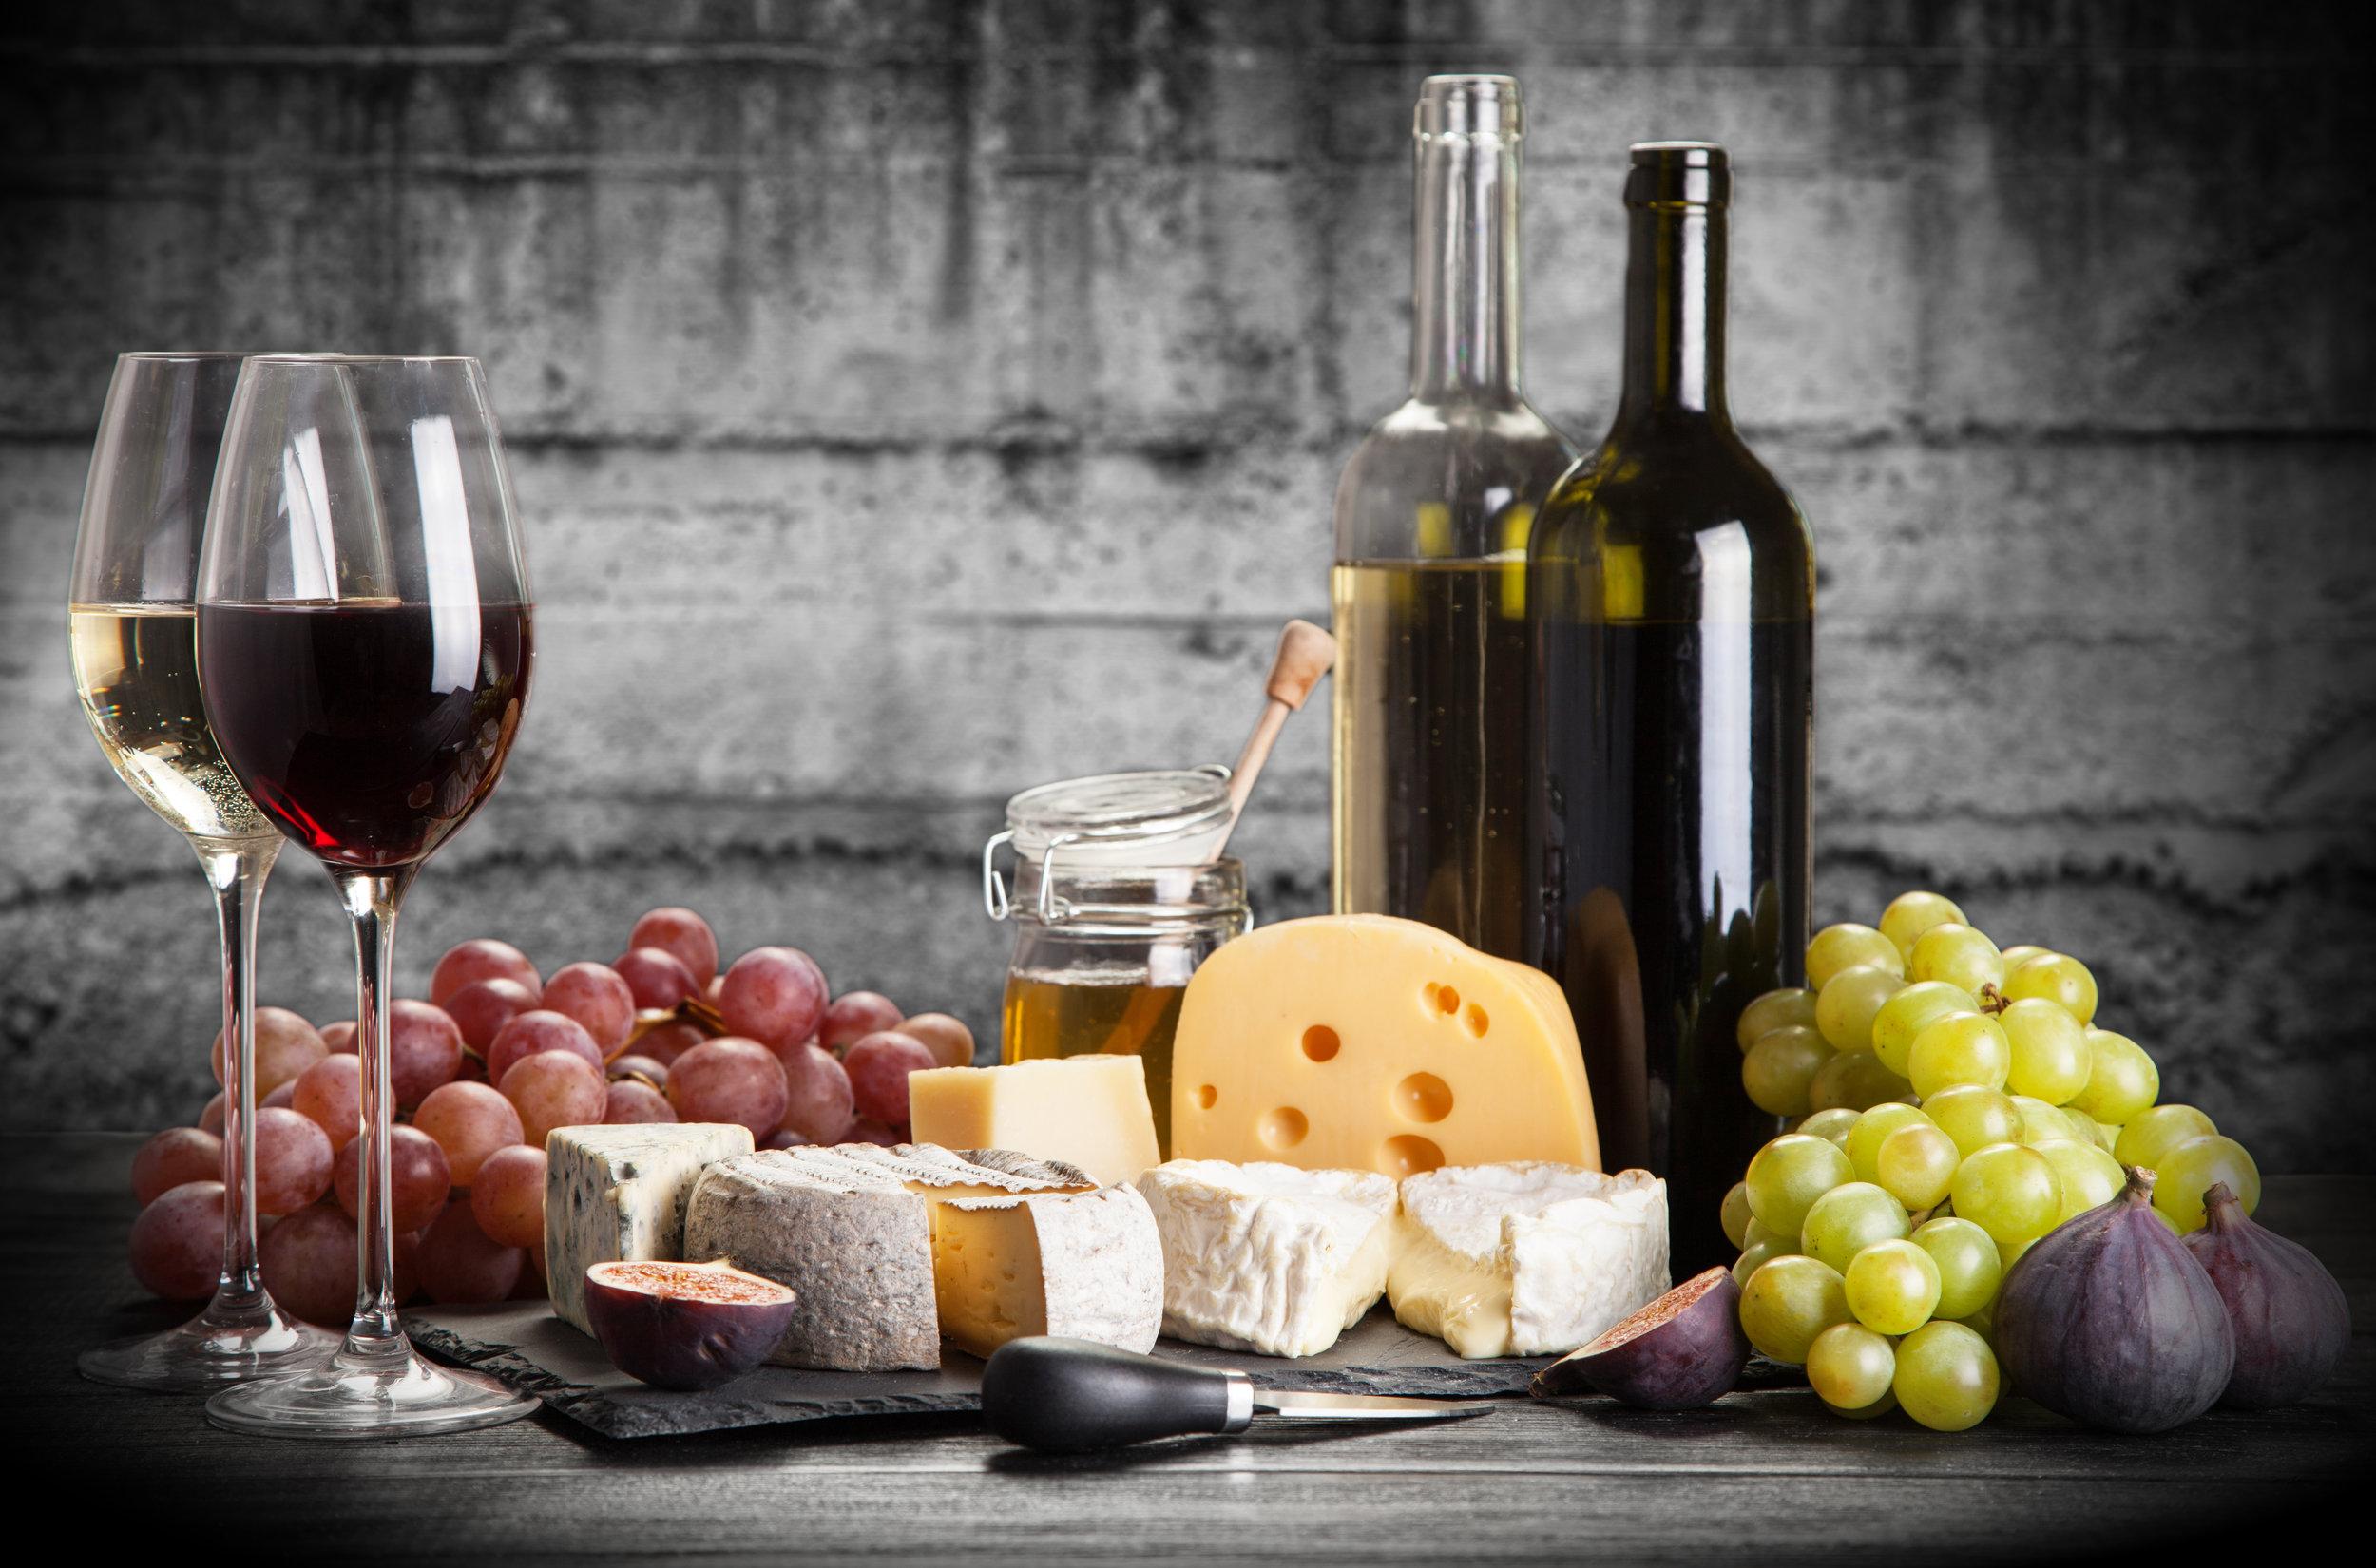 dreamstime wine and cheese.jpg